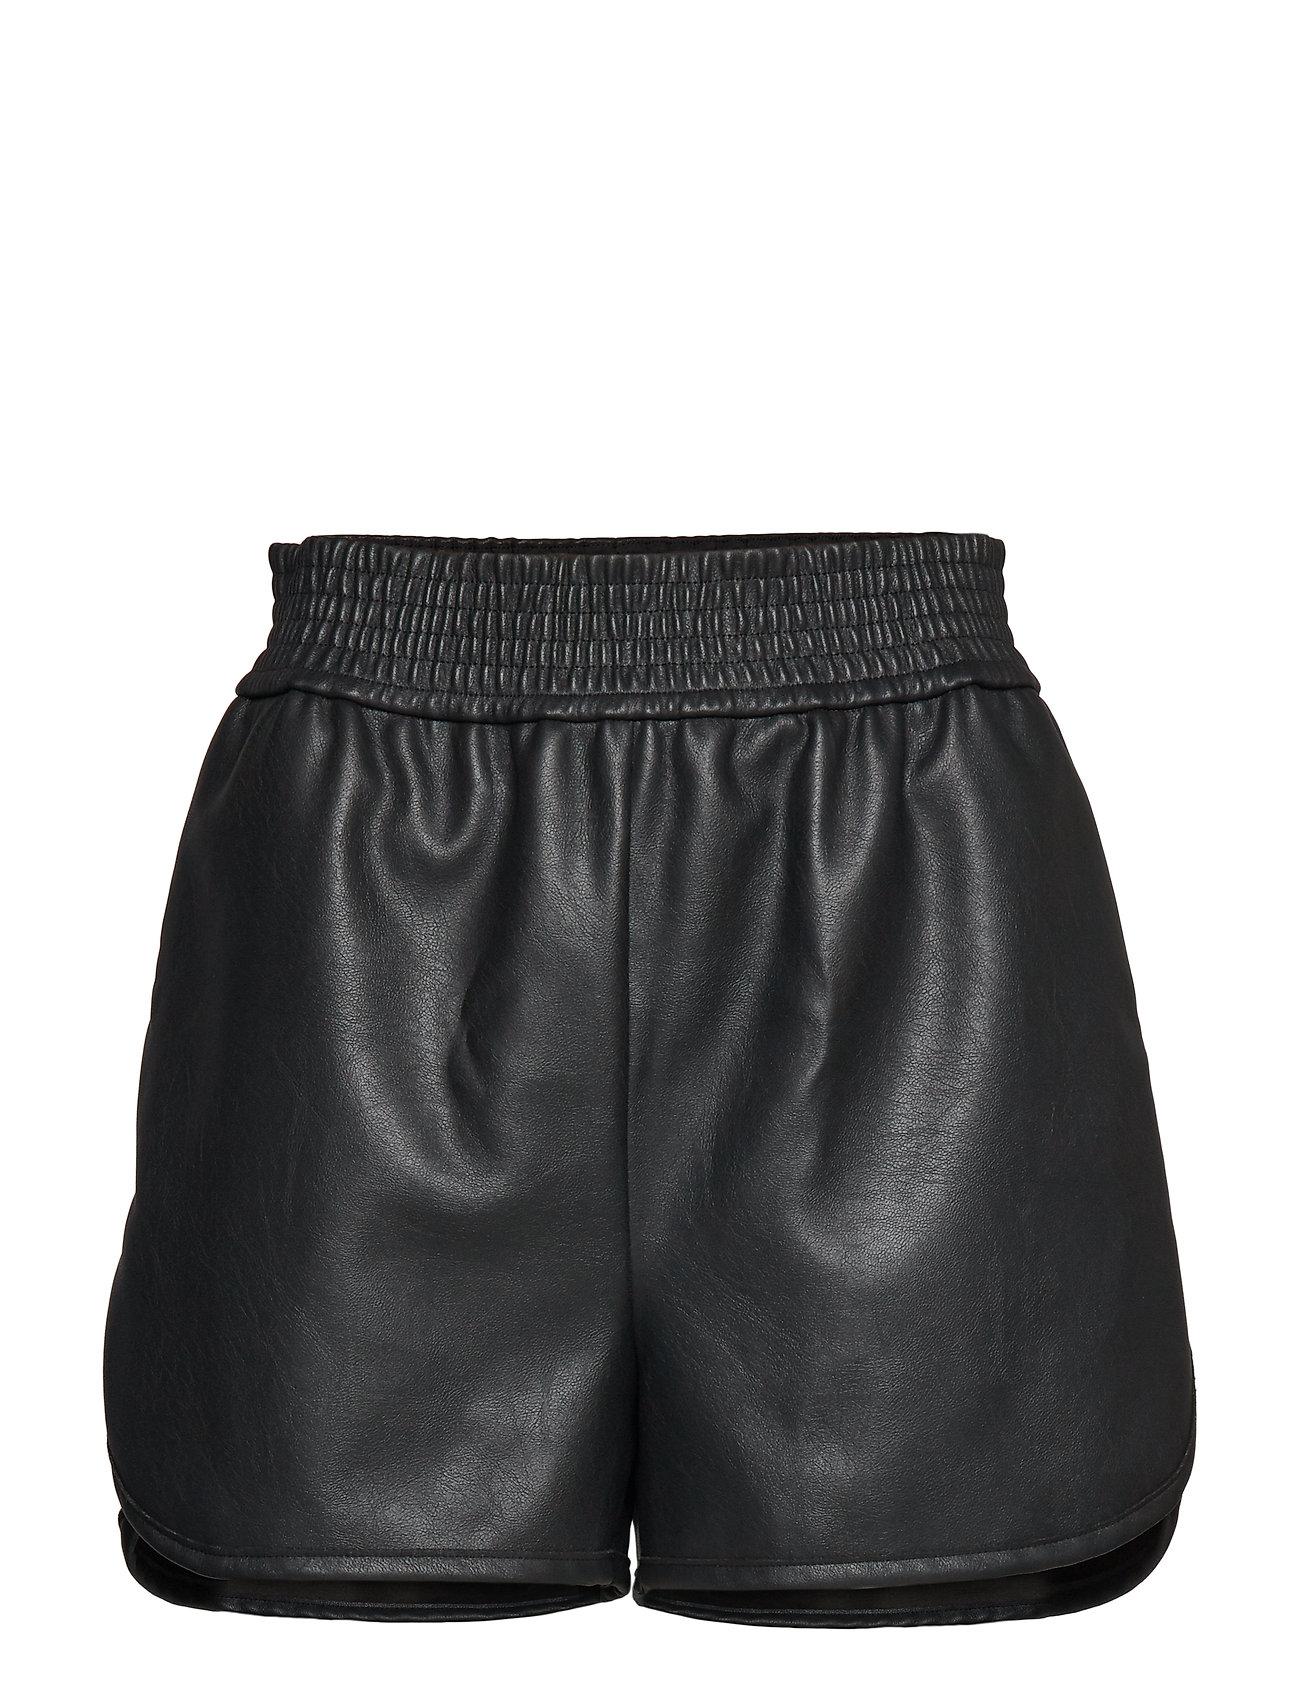 Wolford Stella Shorts - BLACK